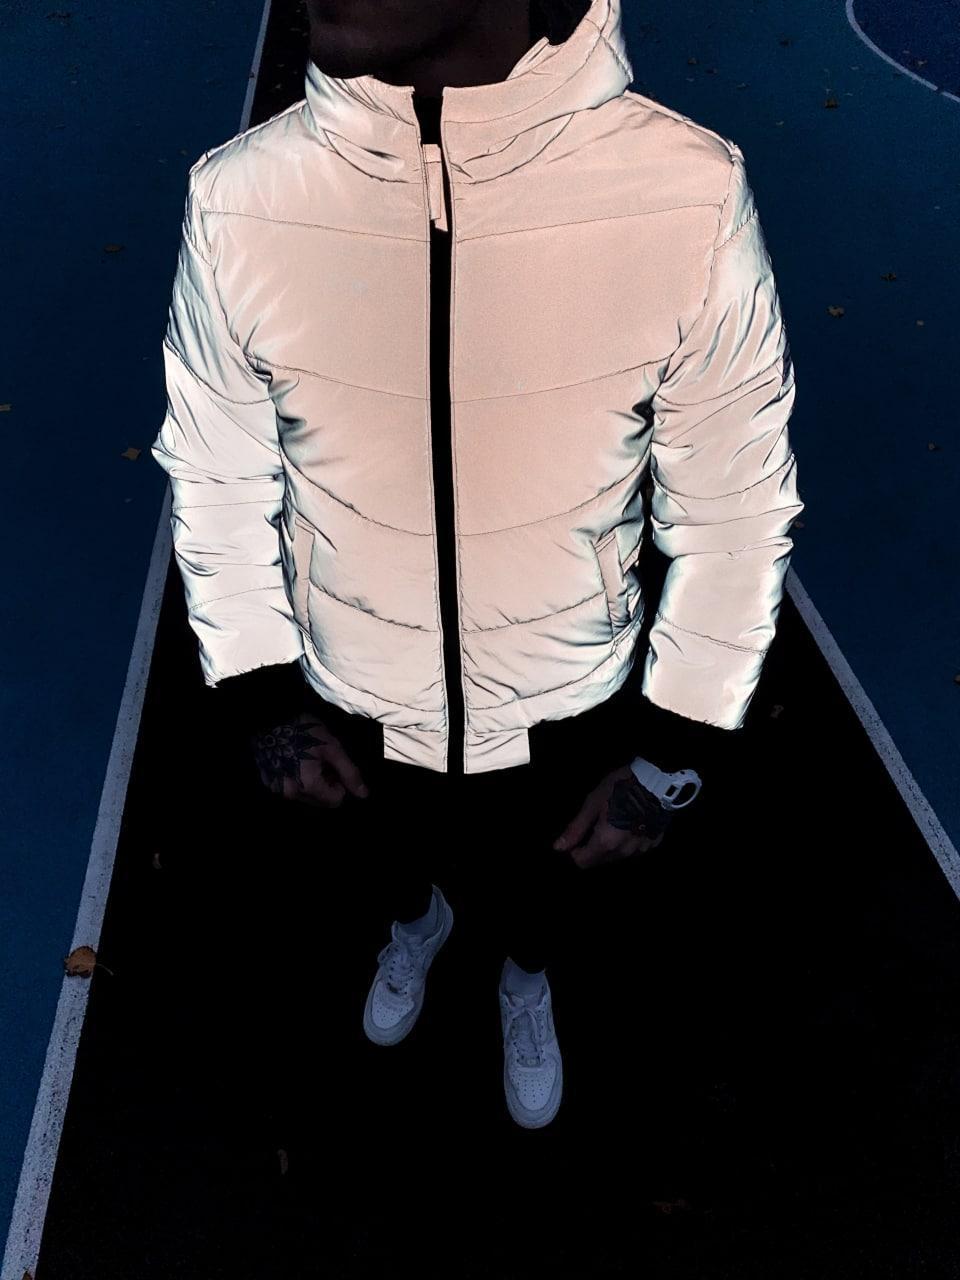 Мужская куртка зимняя рефлектив с капюшоном. Мужская теплая зимняя курточка рефлективная с капюшоном.